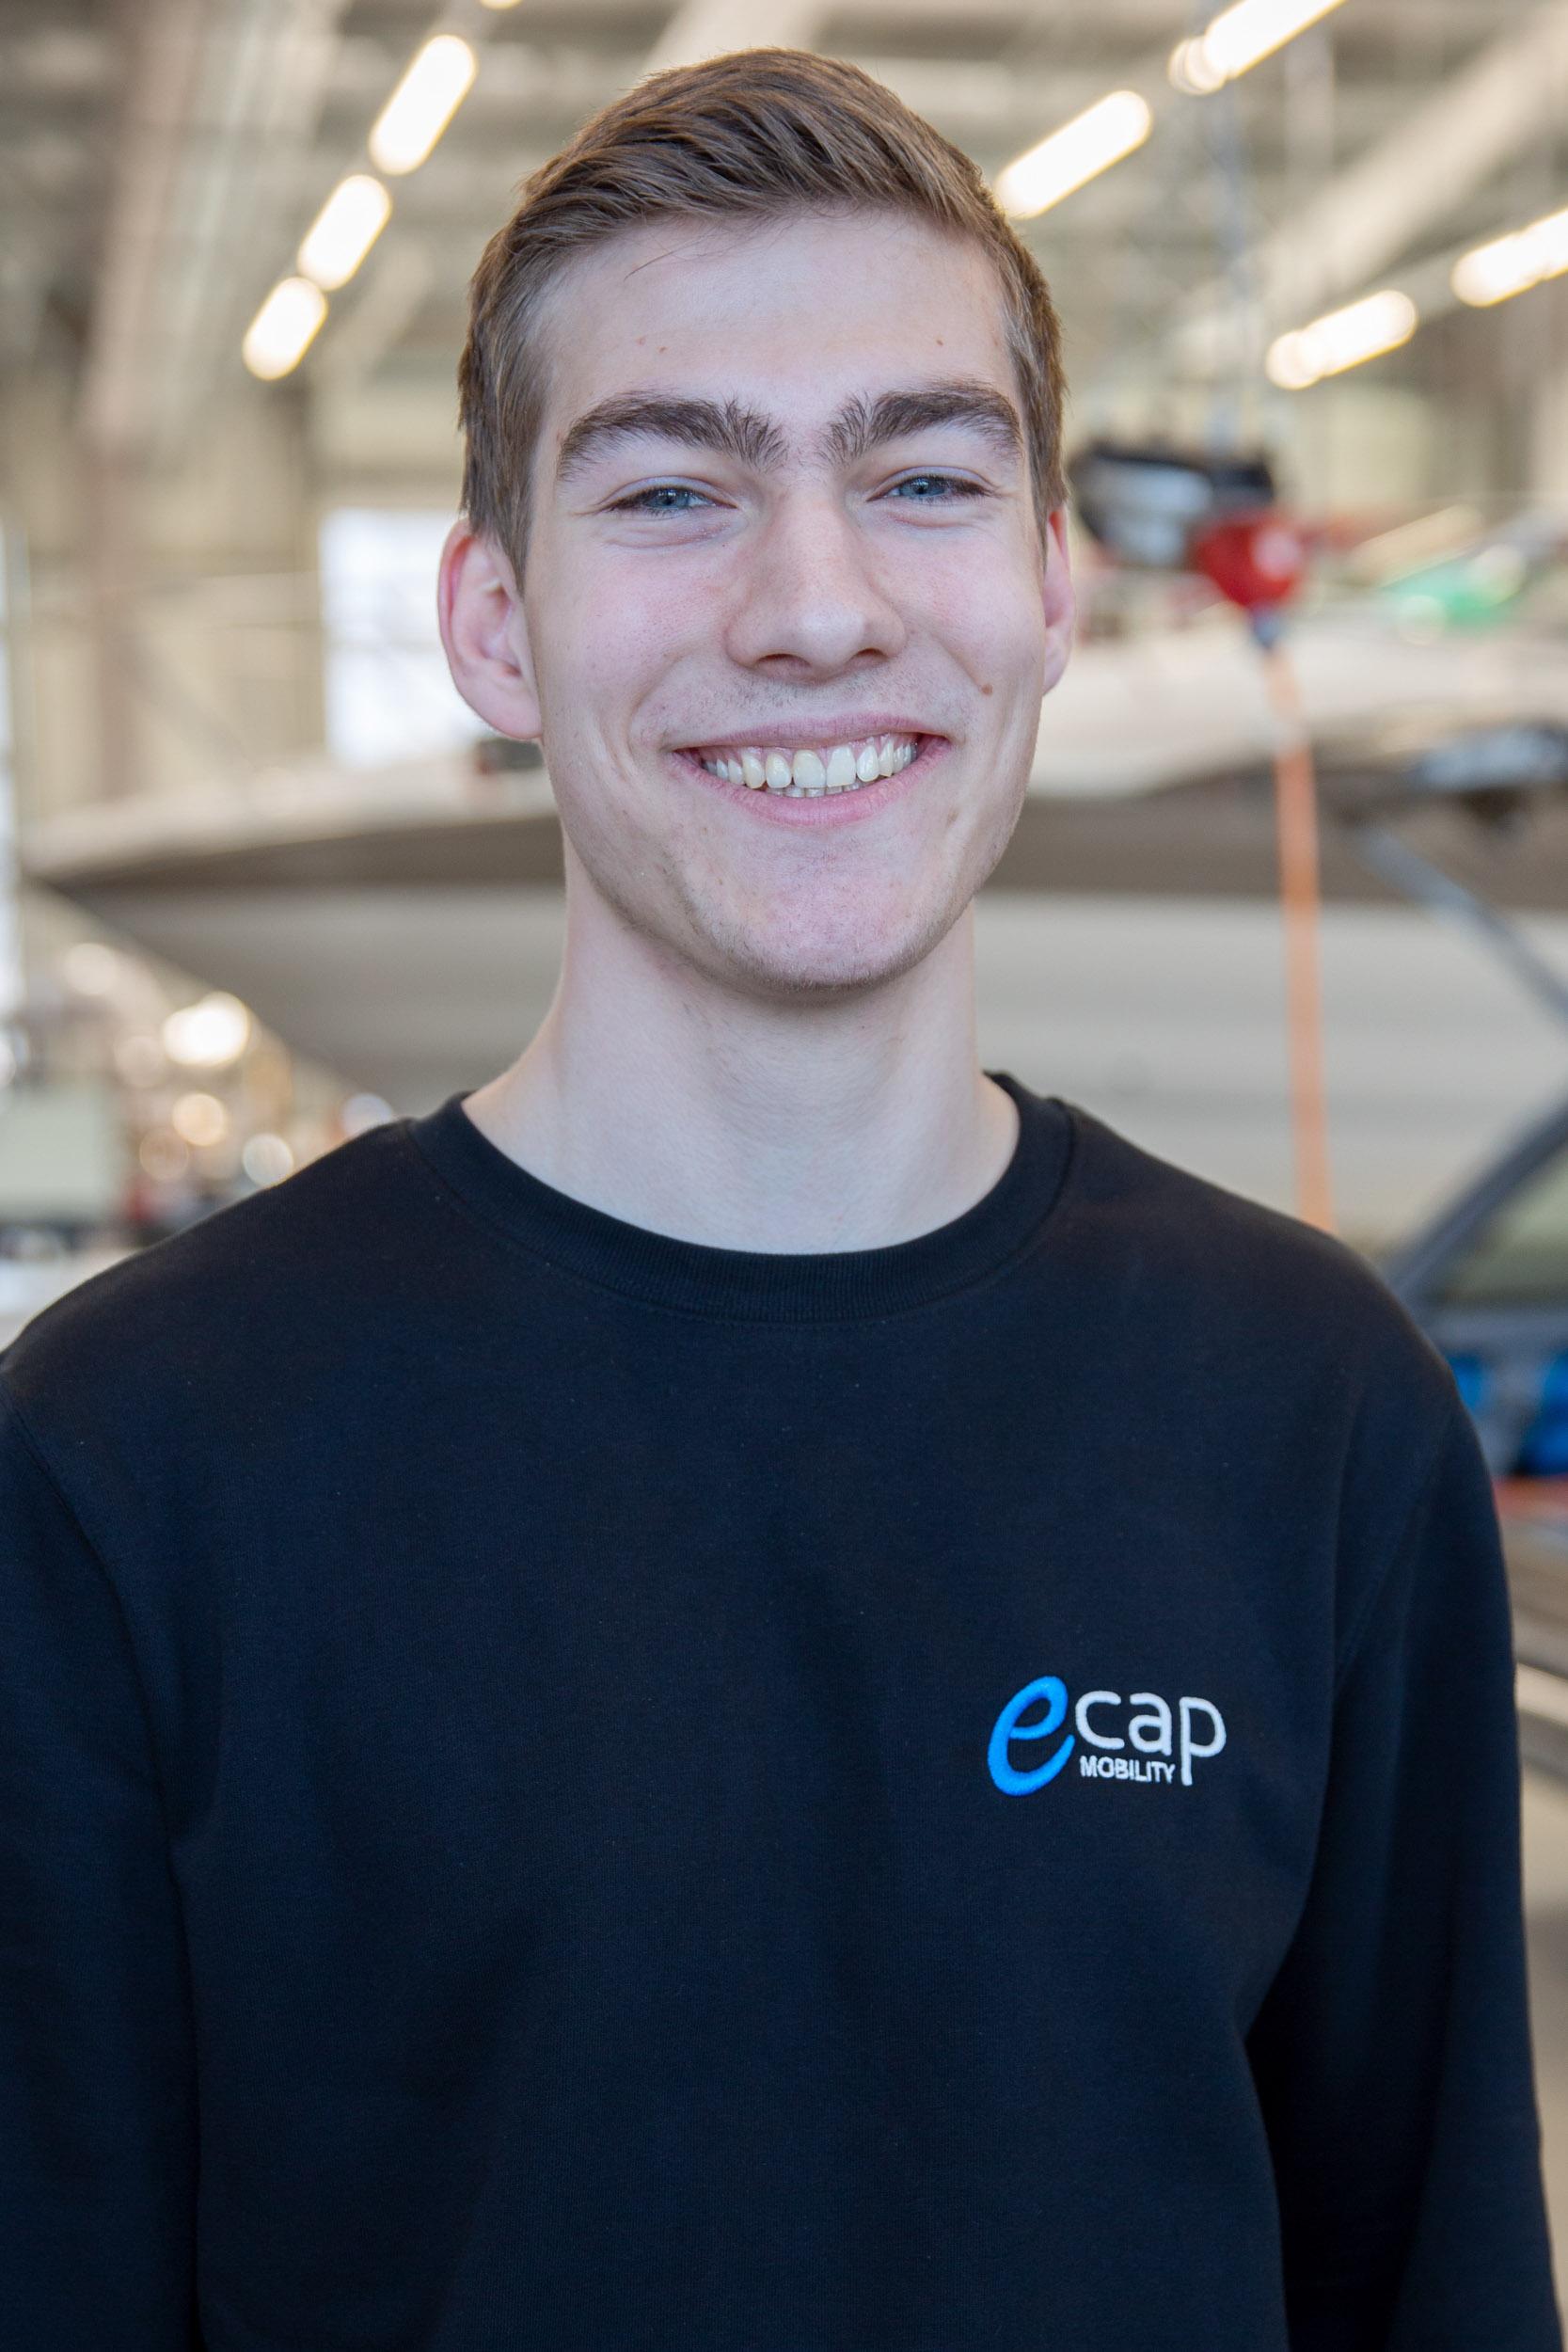 Pascal Busch | Mechatronics Technician pbu@ecap-mobility.com